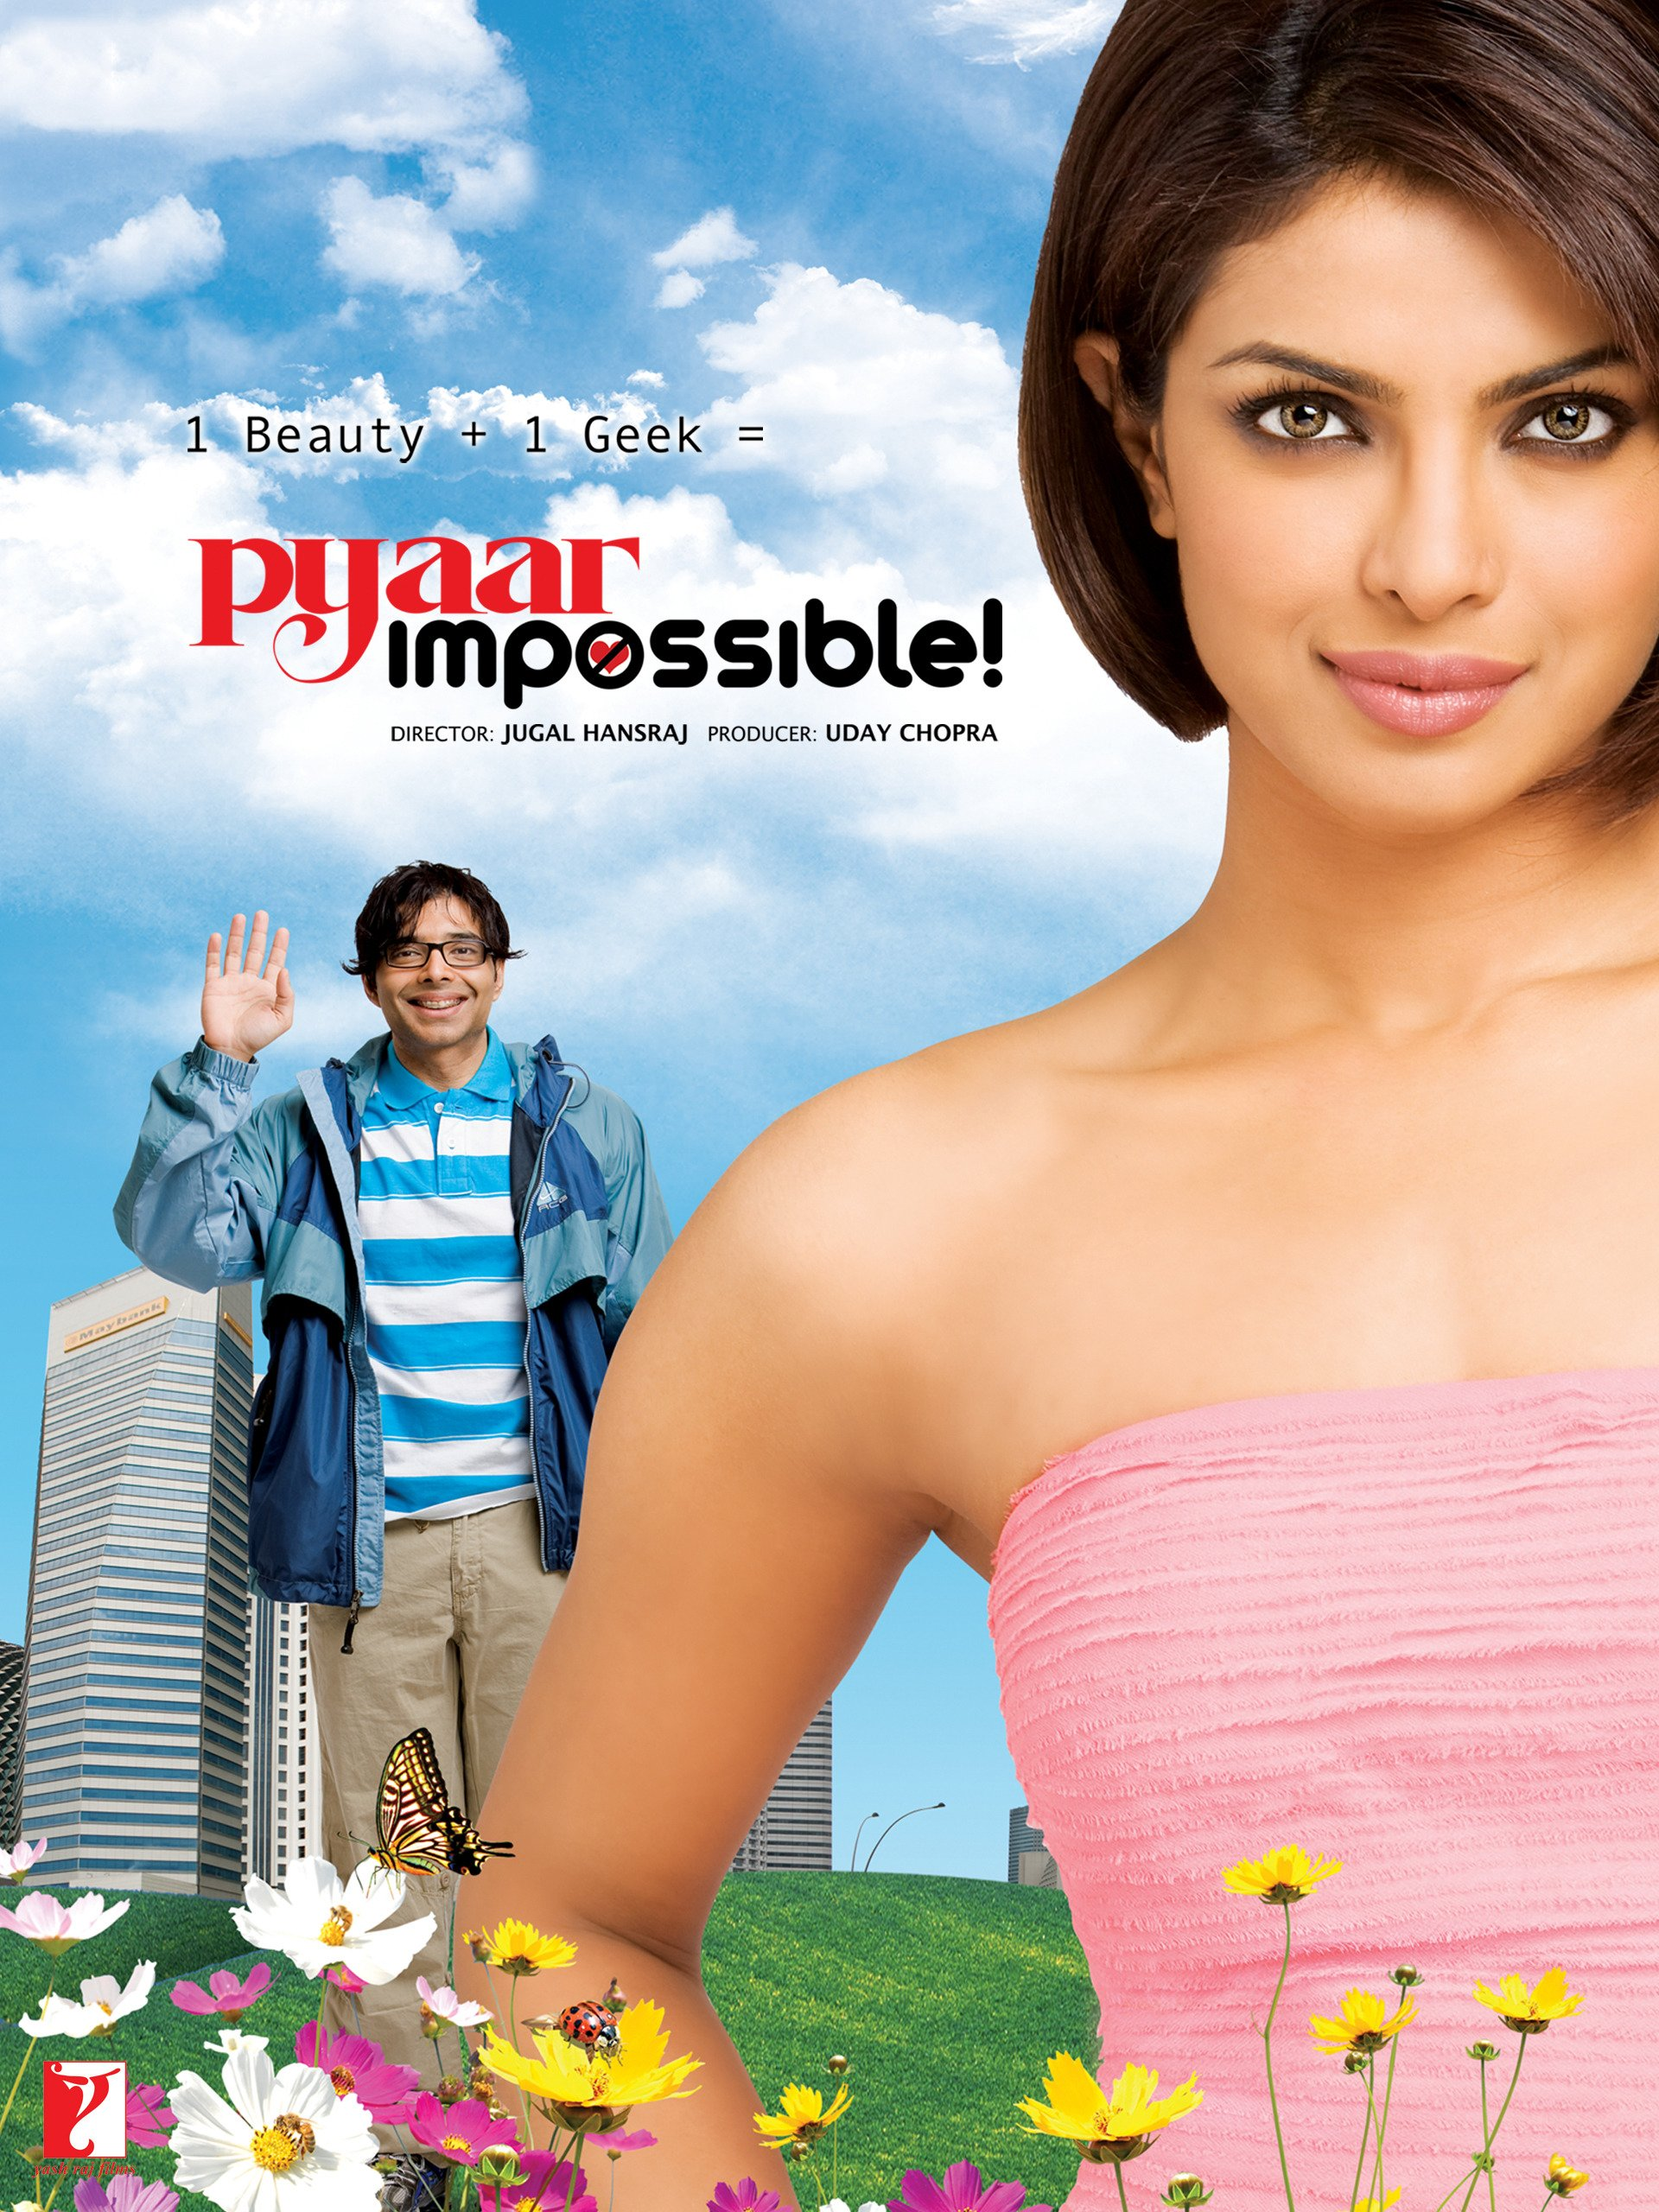 geek charming full movie download mp4